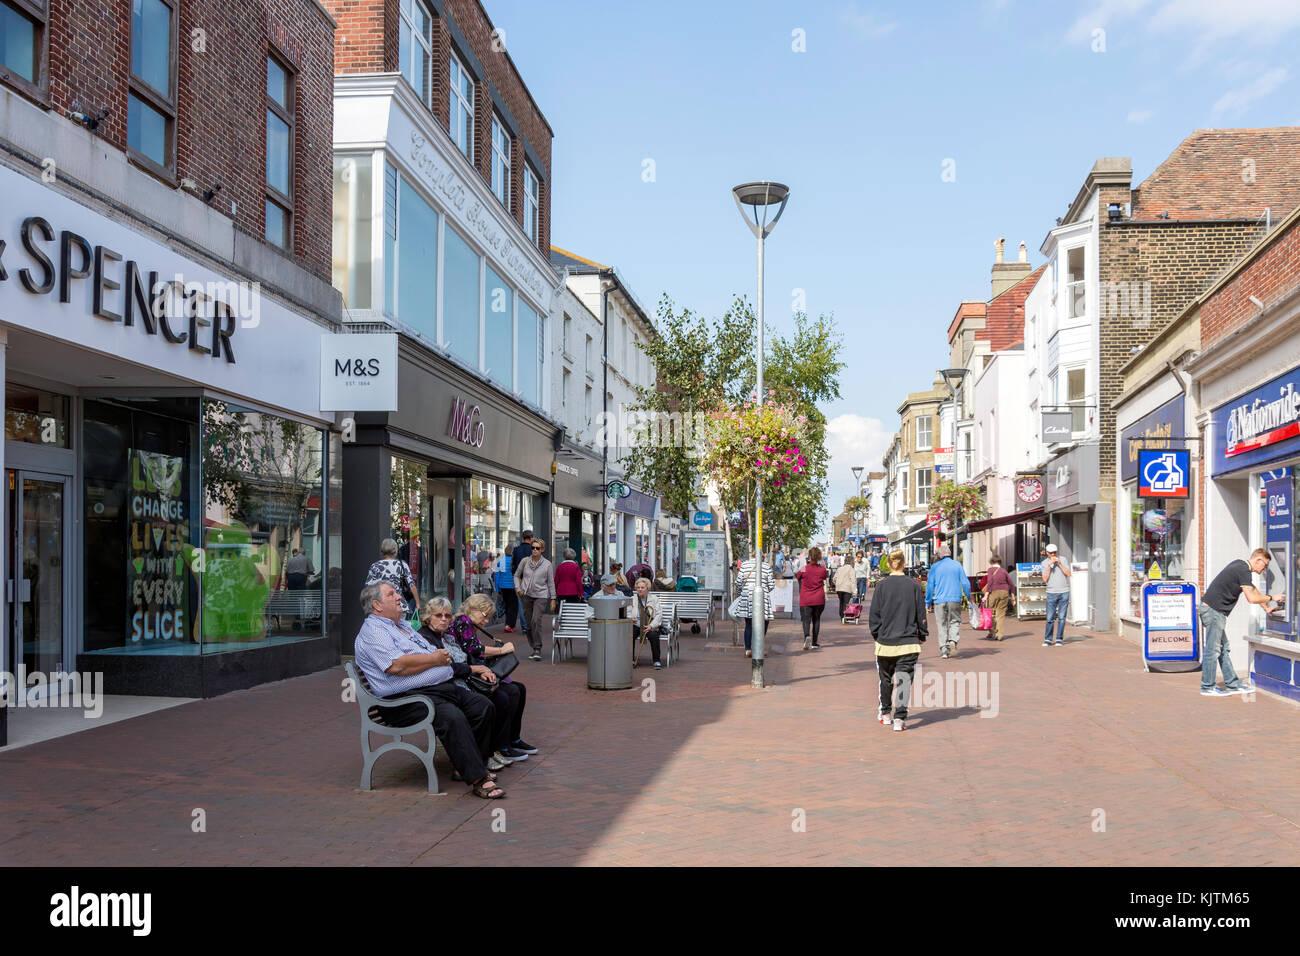 Pedestrianised High Street, Deal, Kent, England, United Kingdom - Stock Image